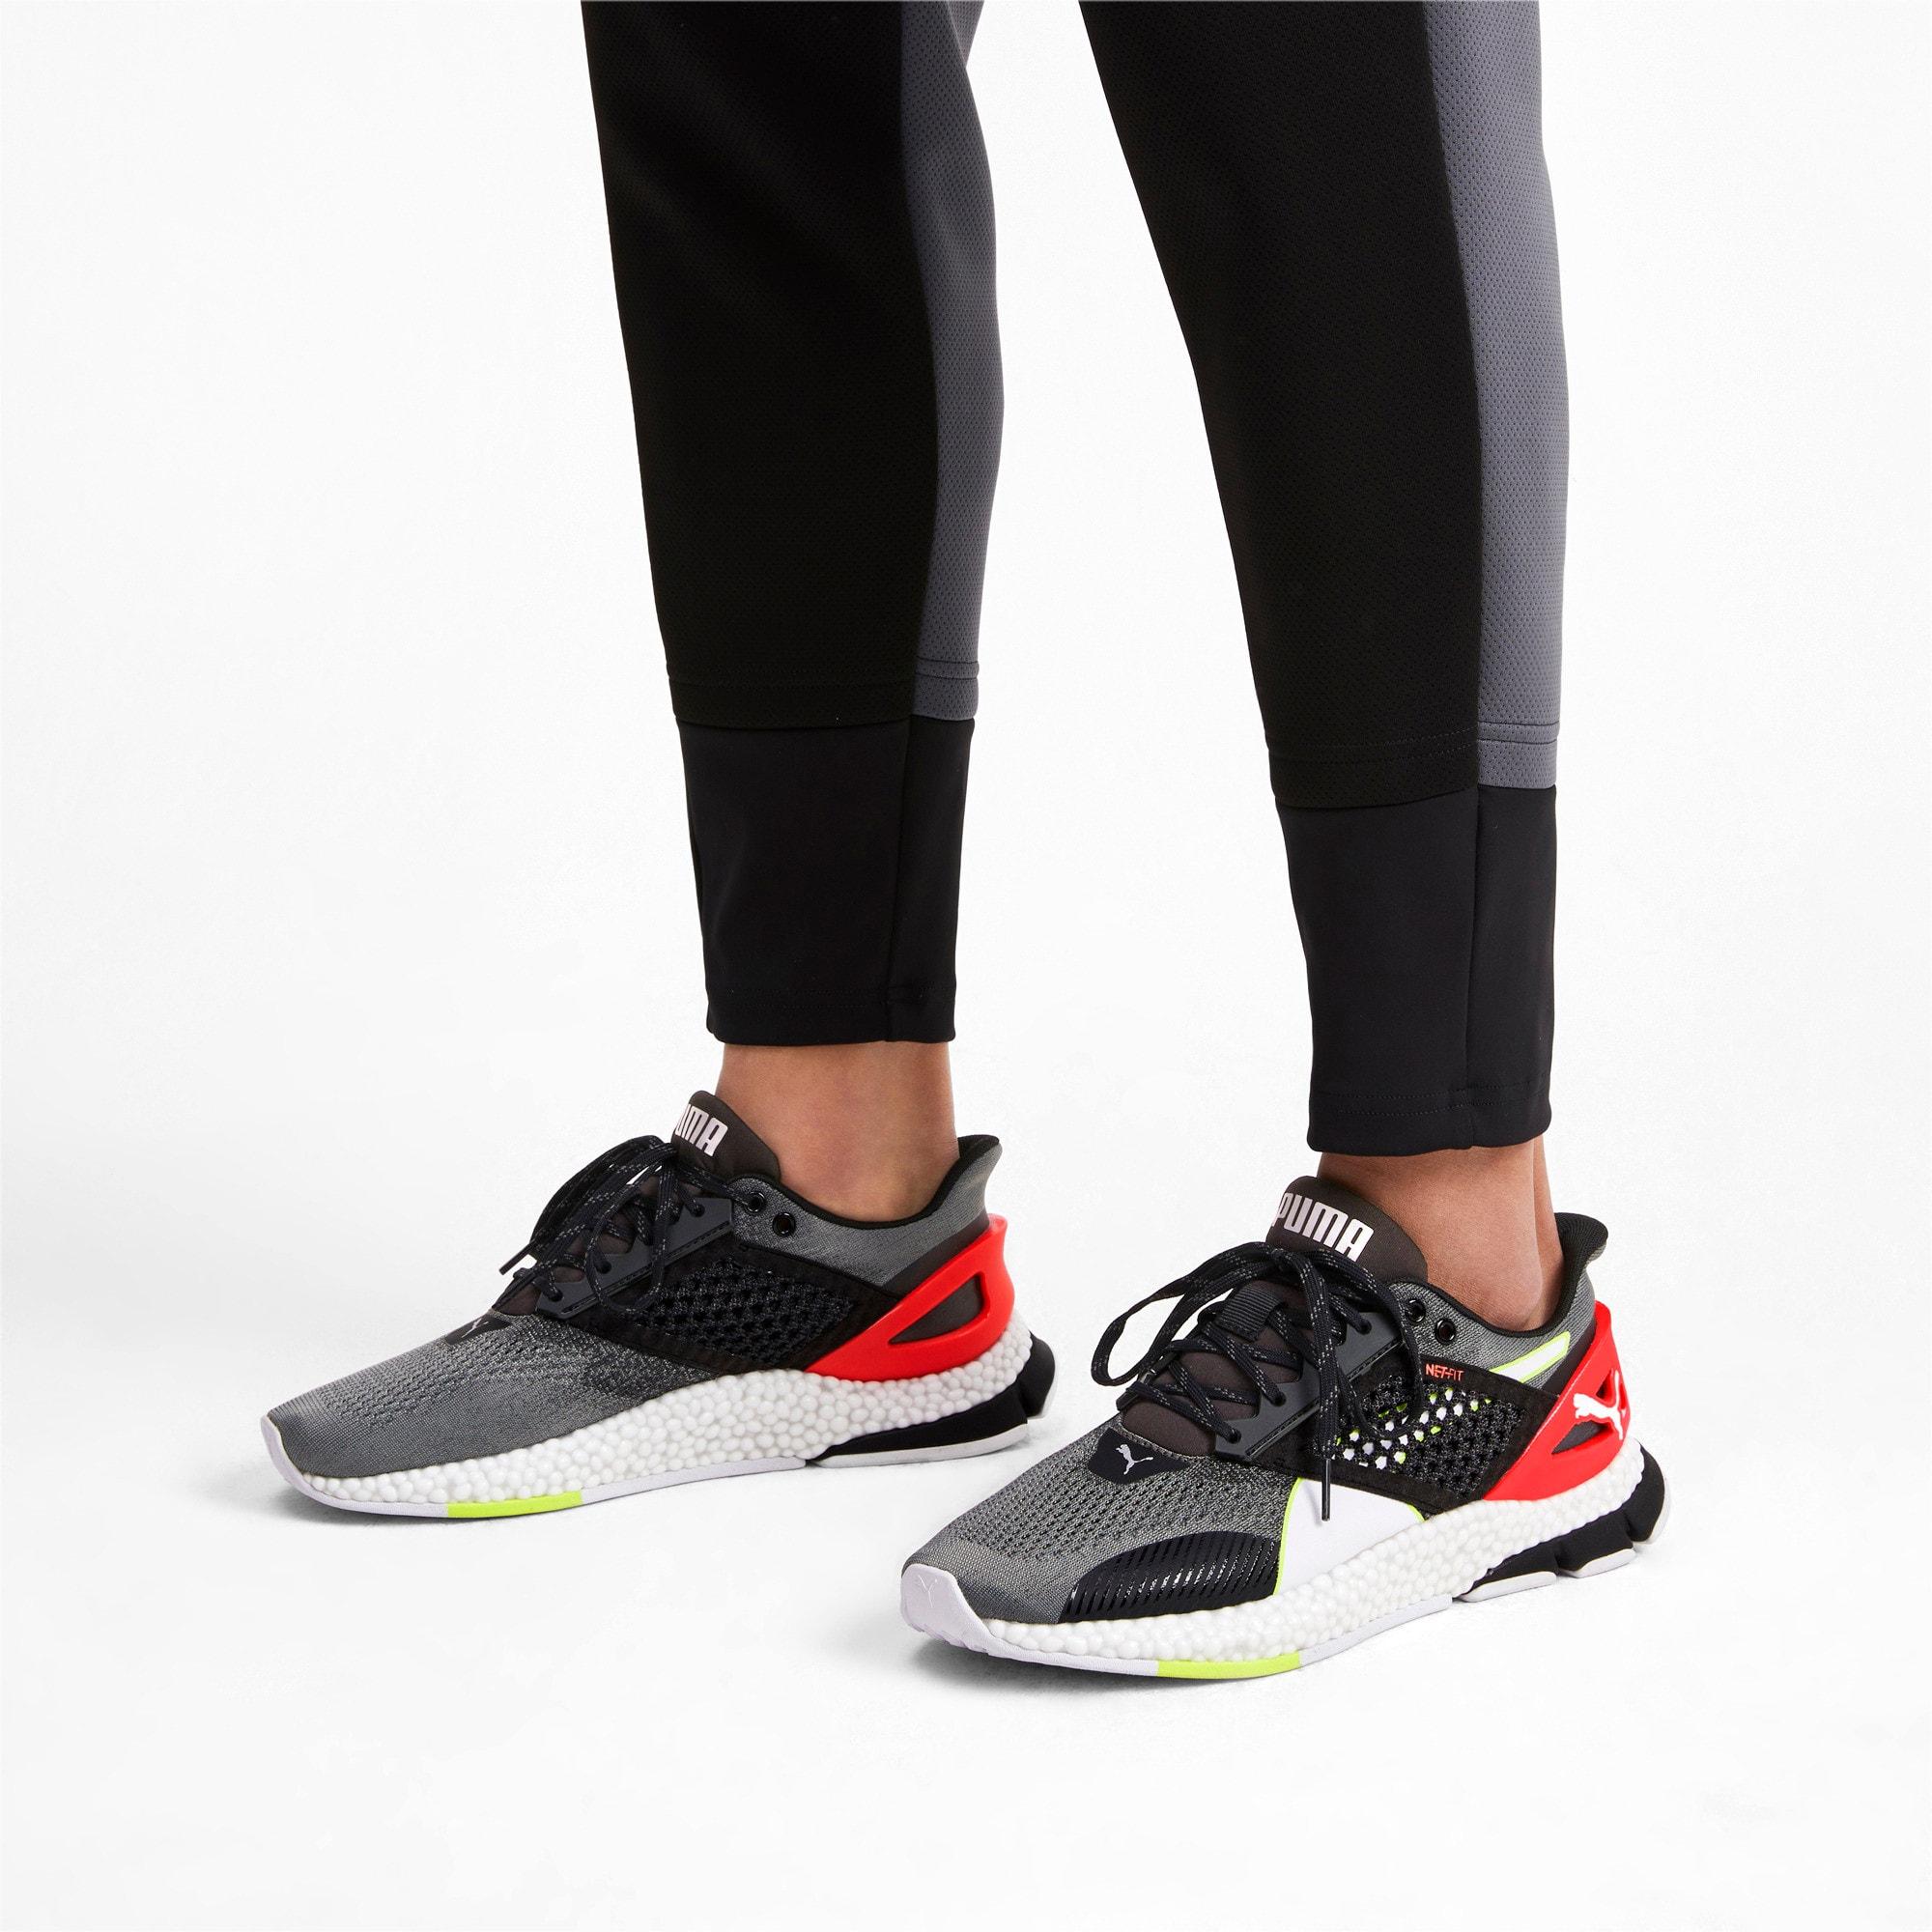 Thumbnail 2 of HYBRID Astro Men's Running Shoes, CASTLEROCK-Puma Blck-Ngy Red, medium